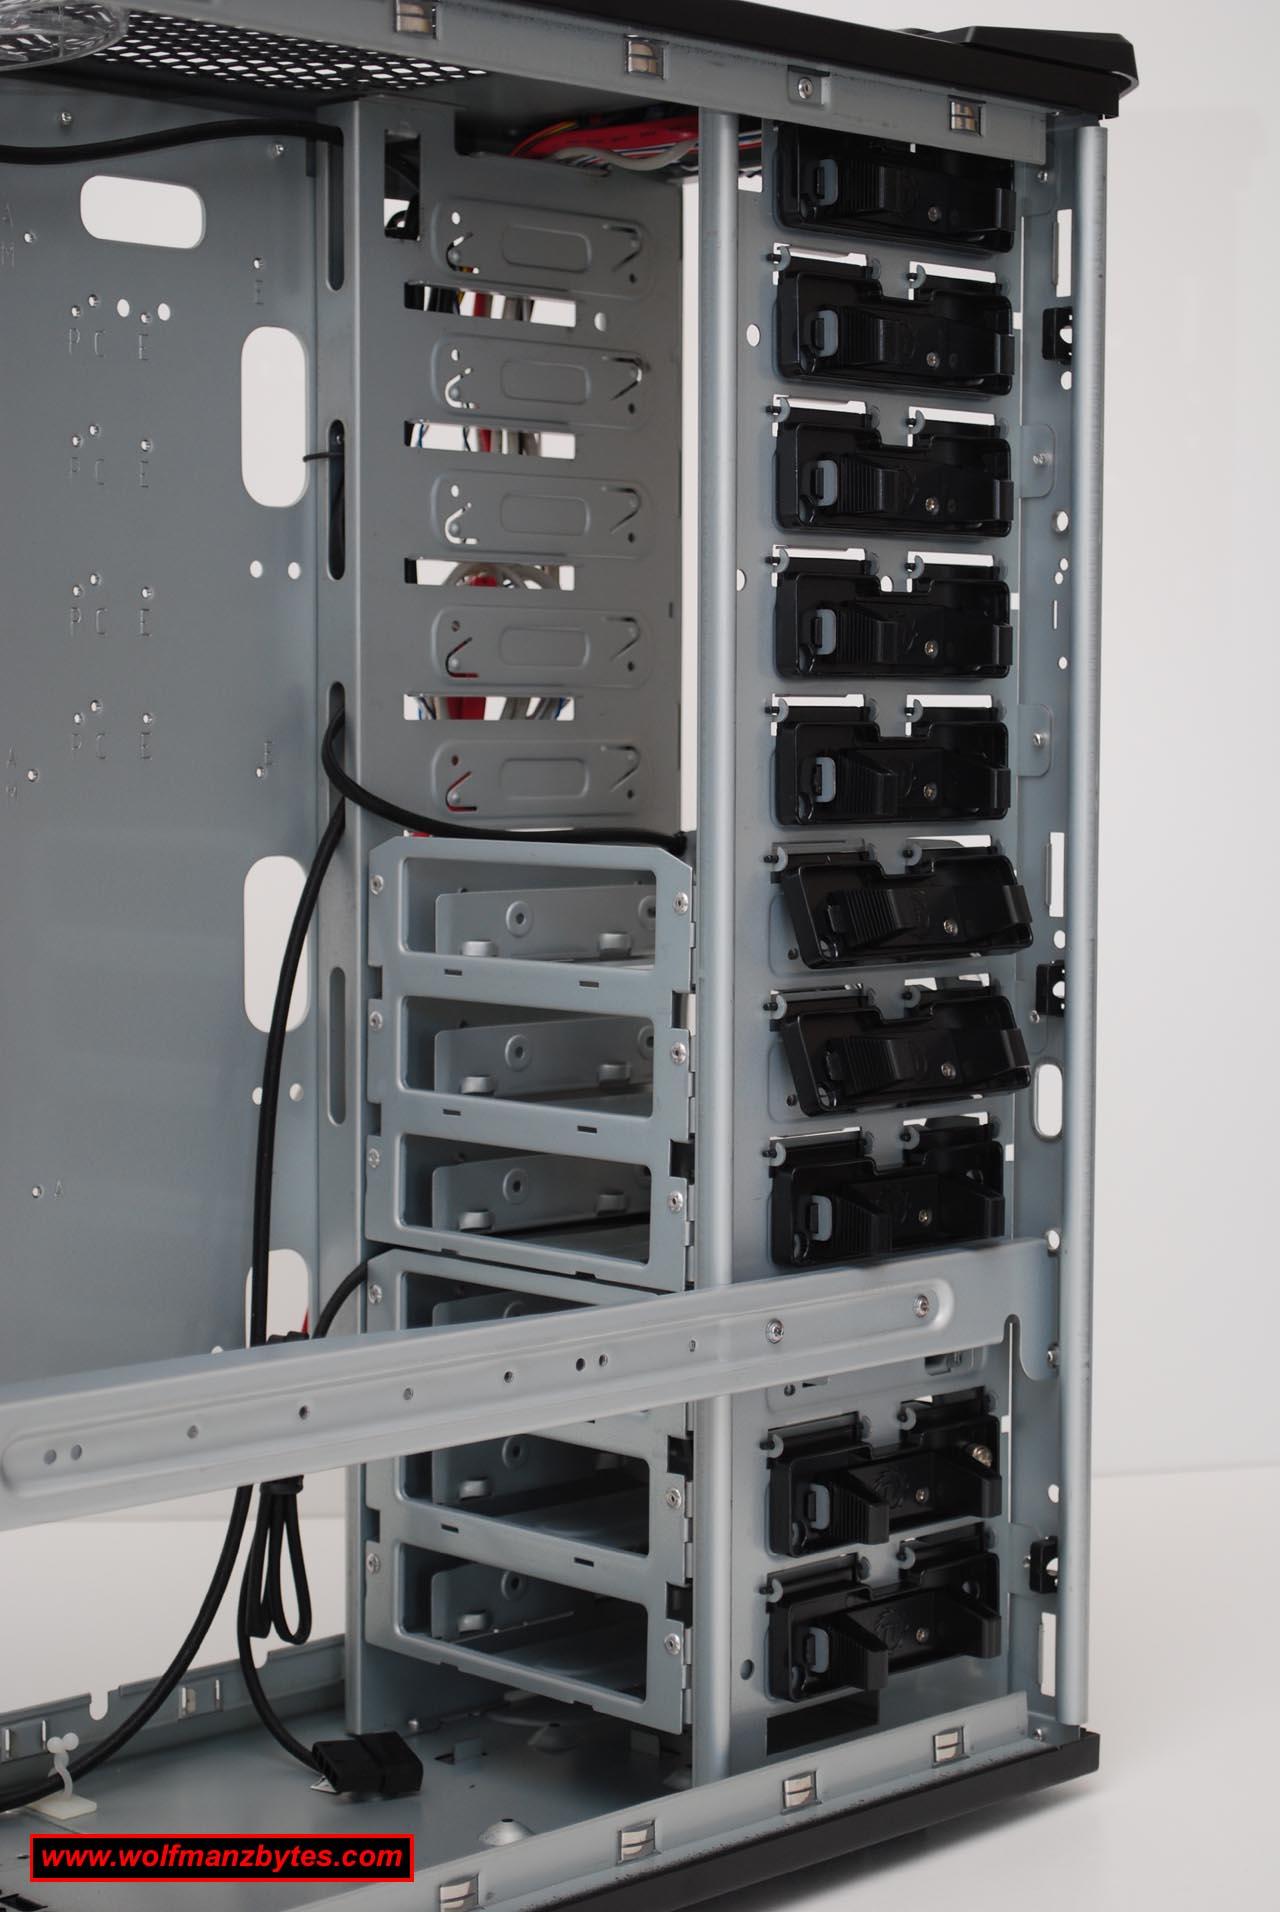 Thermaltake Element V Full Tower Computer Case